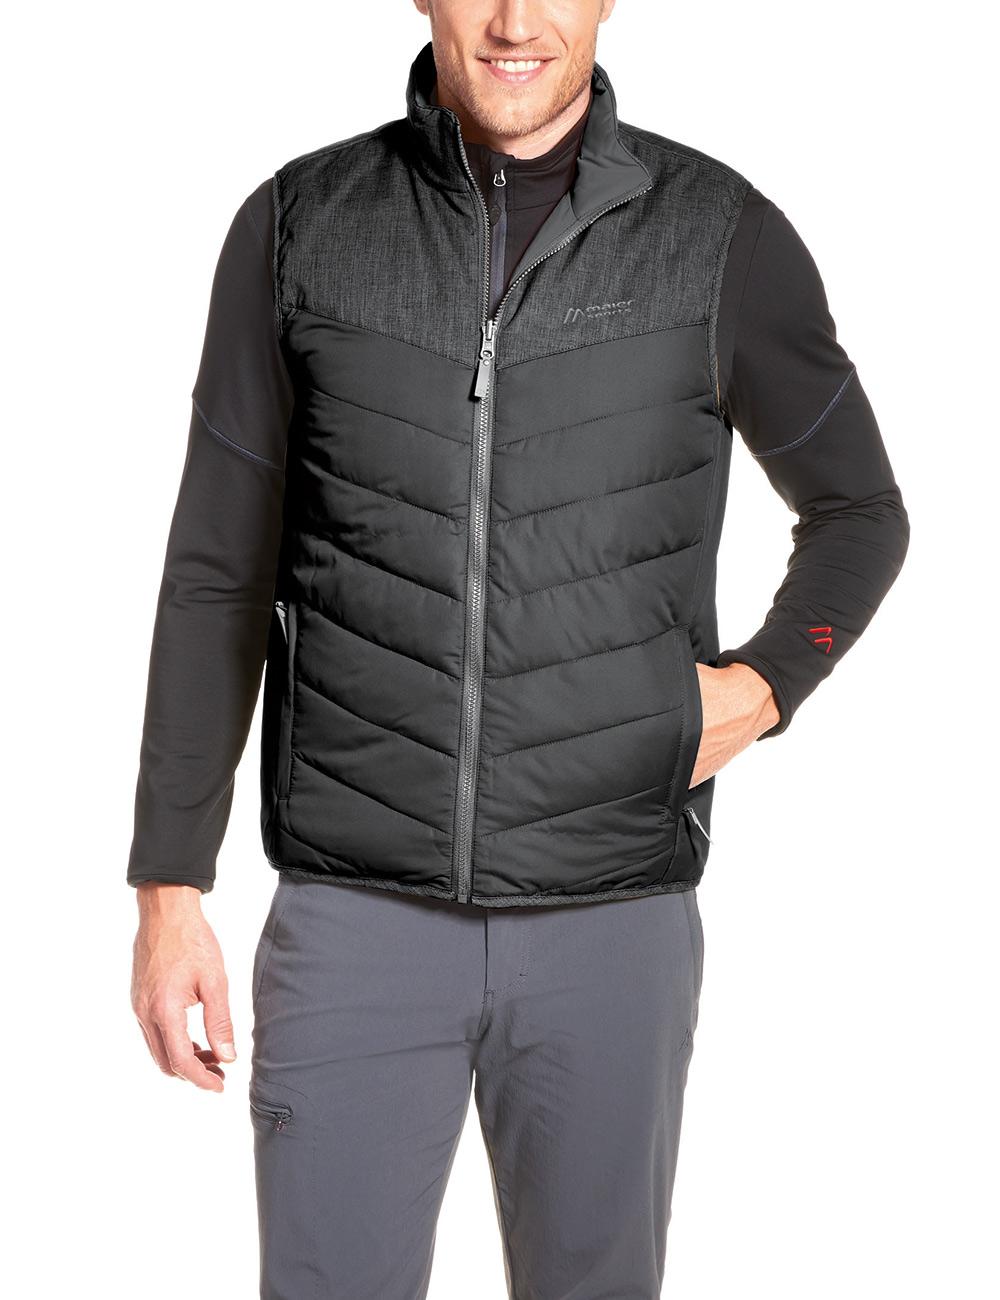 Maier Sports - Gero Vest - He-Weste/Wendew - black - 64